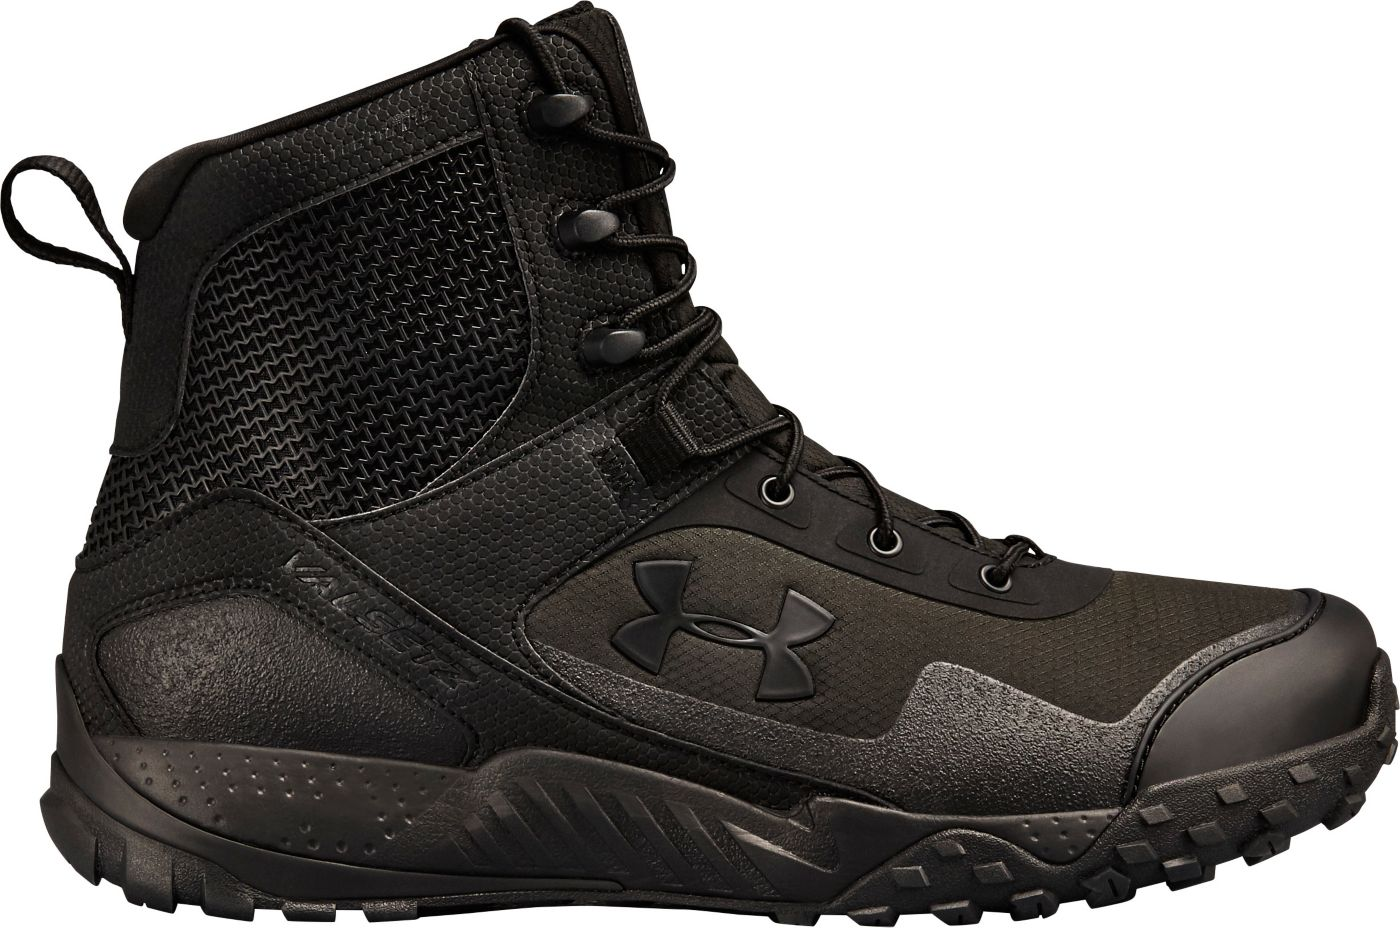 Under Armour Men's Valsetz RTS 1.5 Side Zip Tactical Boots